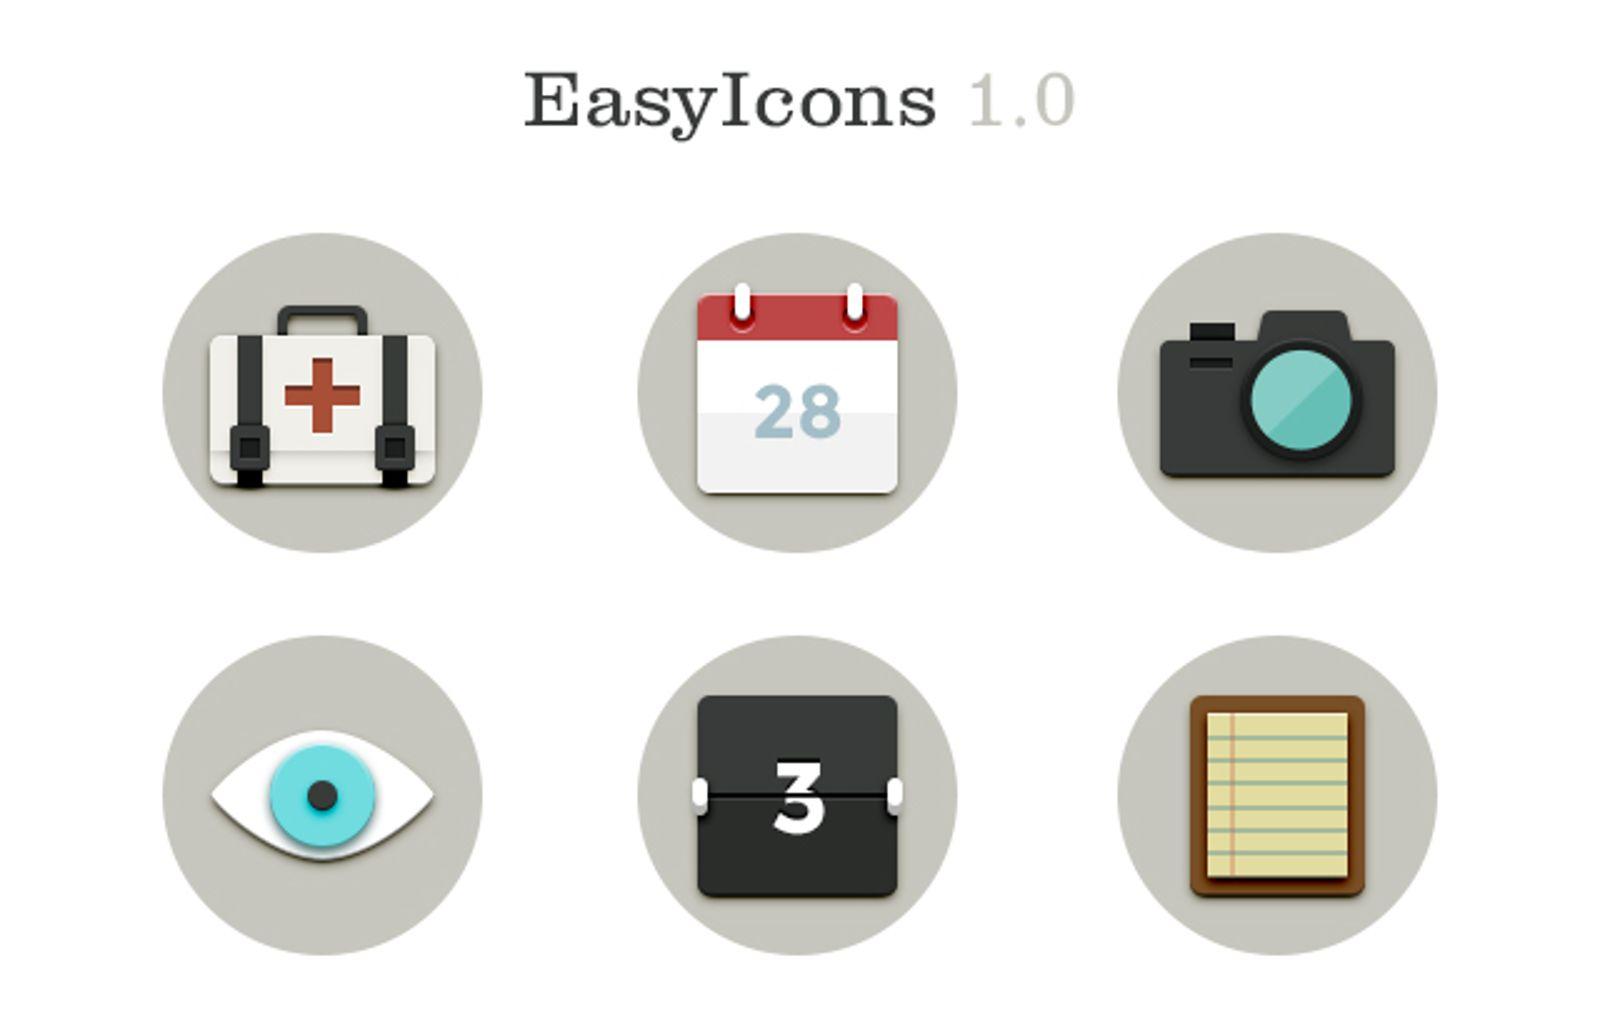 Easyicons 1